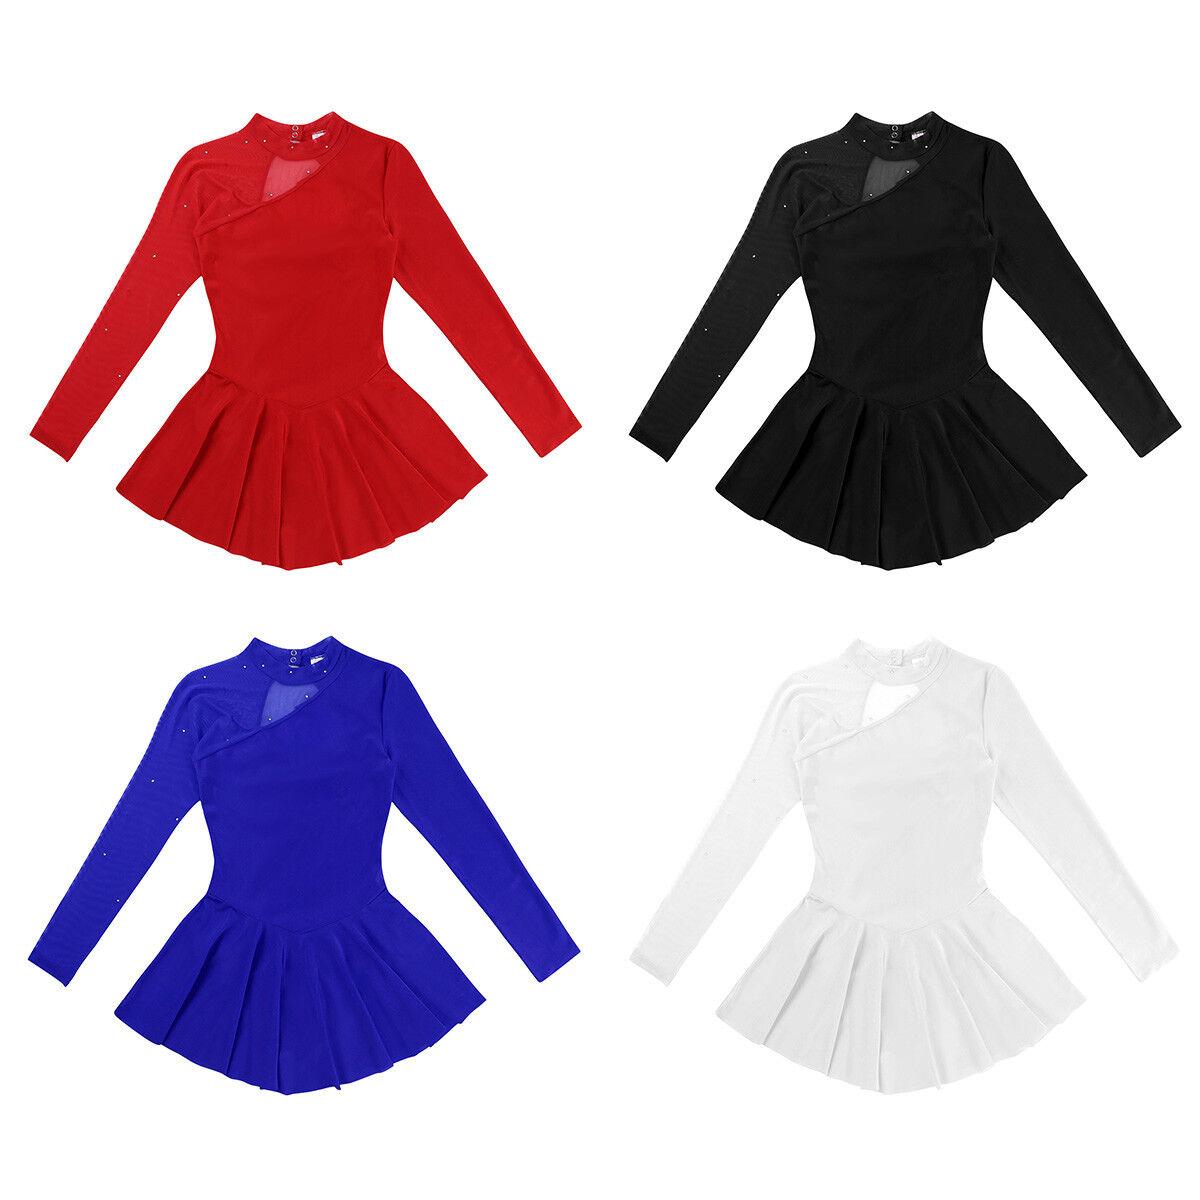 ladies long sleeve dance dress elegant ballet dress ballet dance jersey  with skirt